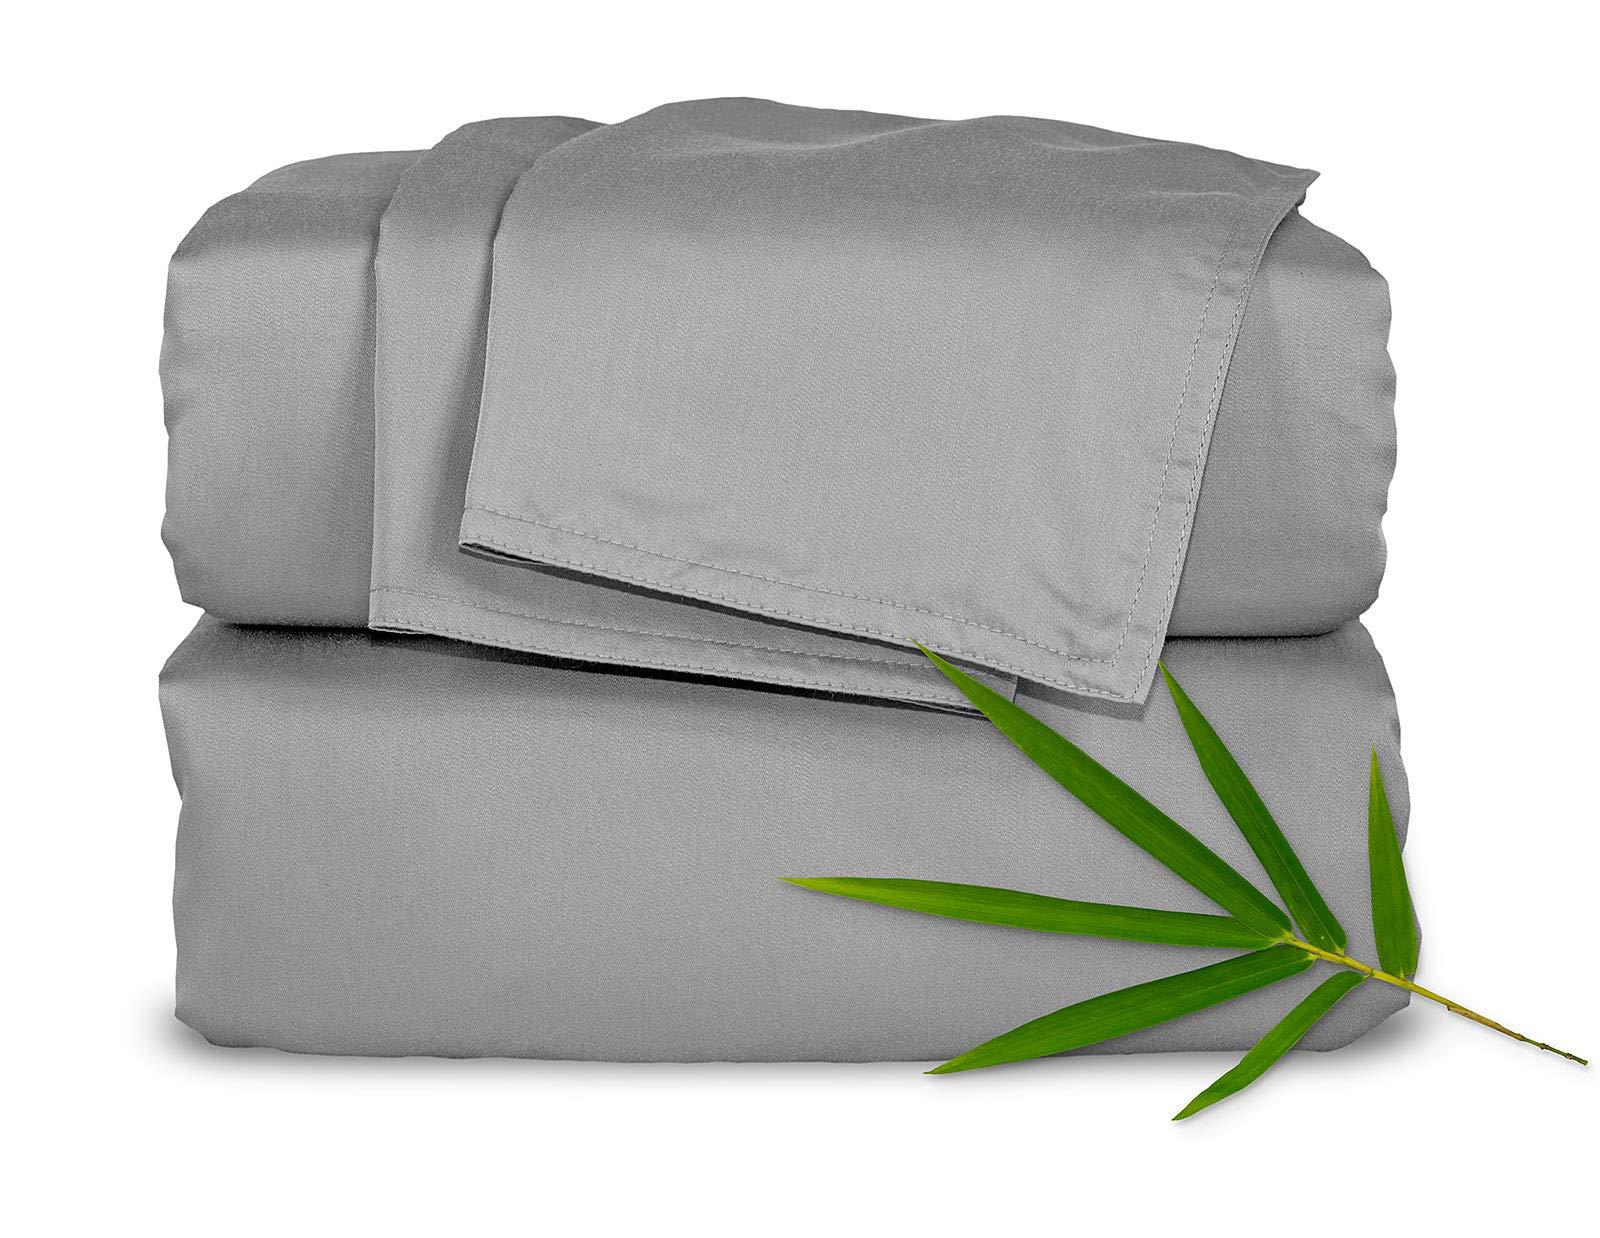 Pure Bamboo Sheets King 4pc Bed Sheet Set - 100% Bamboo Luxuriously Soft Bed Sheets (King, Stone Grey)